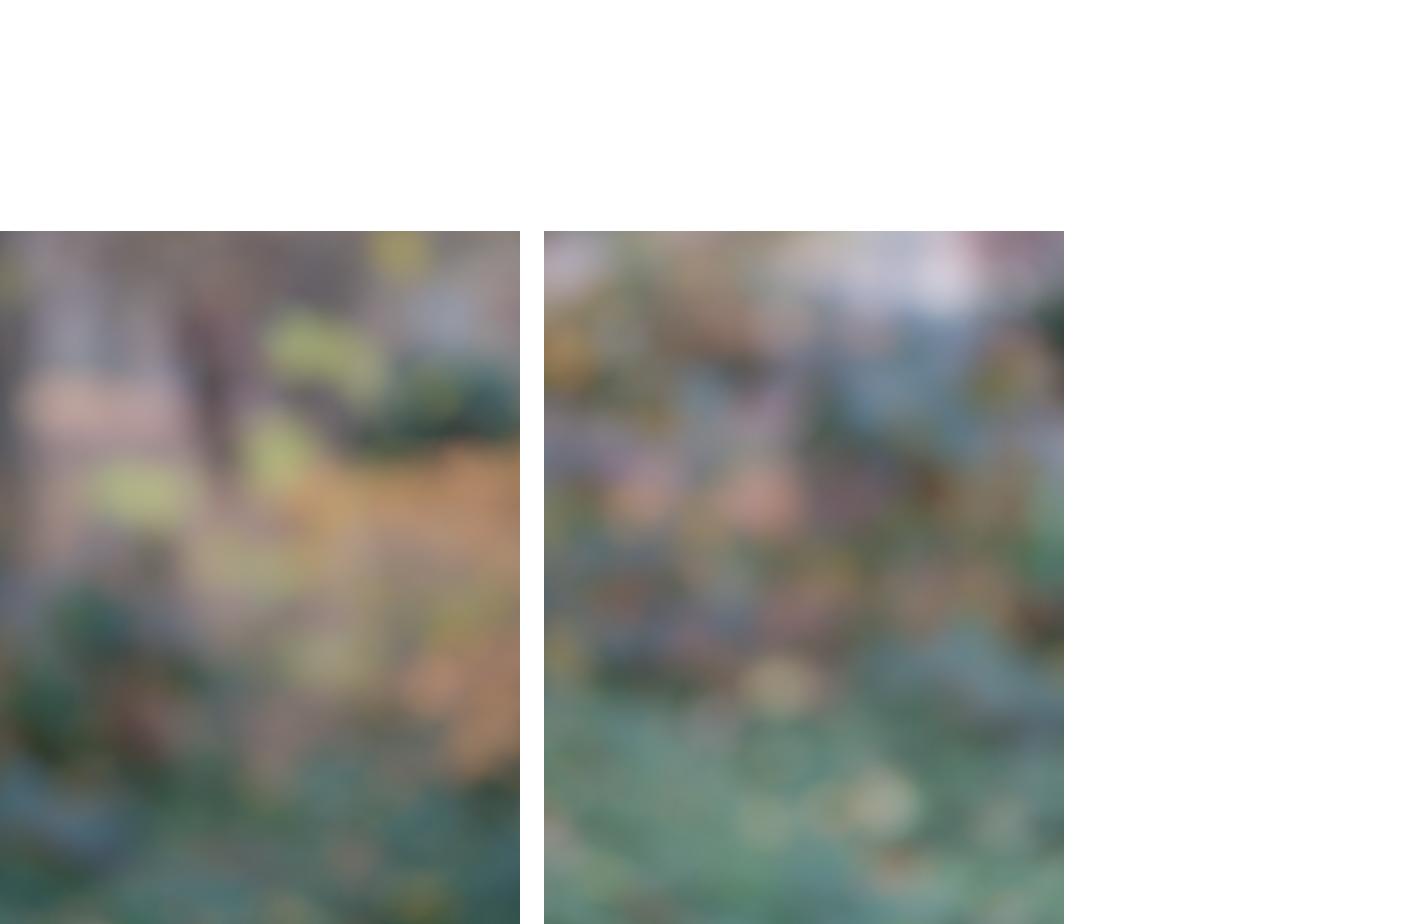 4699-28 Random Pairings #28 4699-29 Random Pairings #29  Pigment Print 5.25 x 7.00 inch Image Size 8.50 x 11.00 inch Paper Size 2 EDP / 4AP